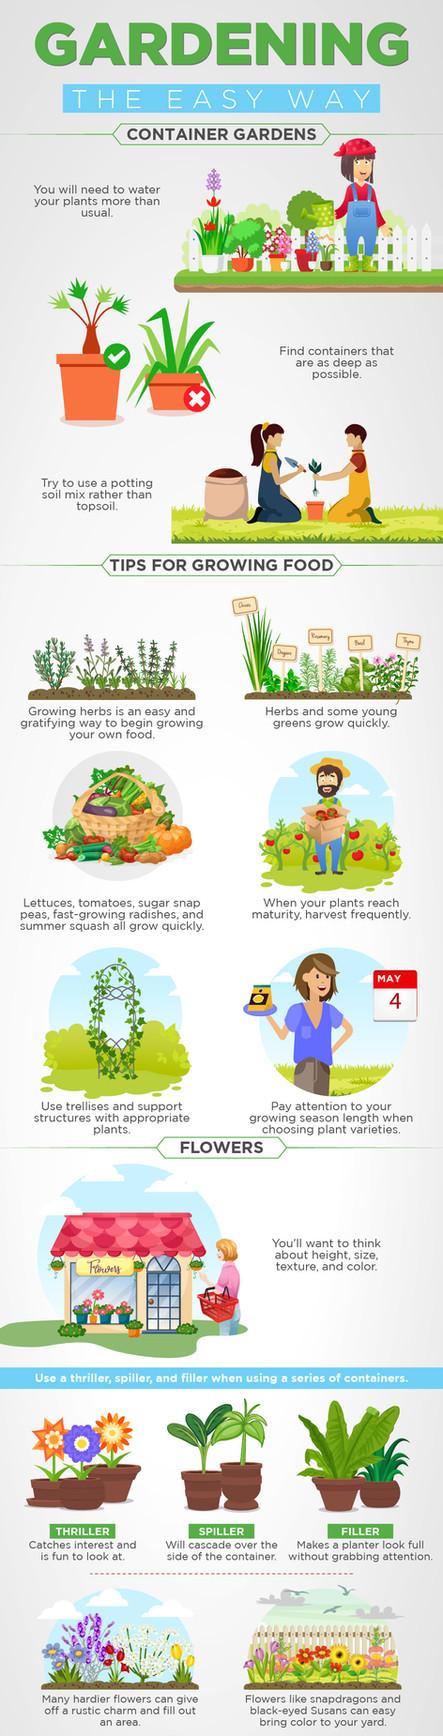 Gardening the Easy Way